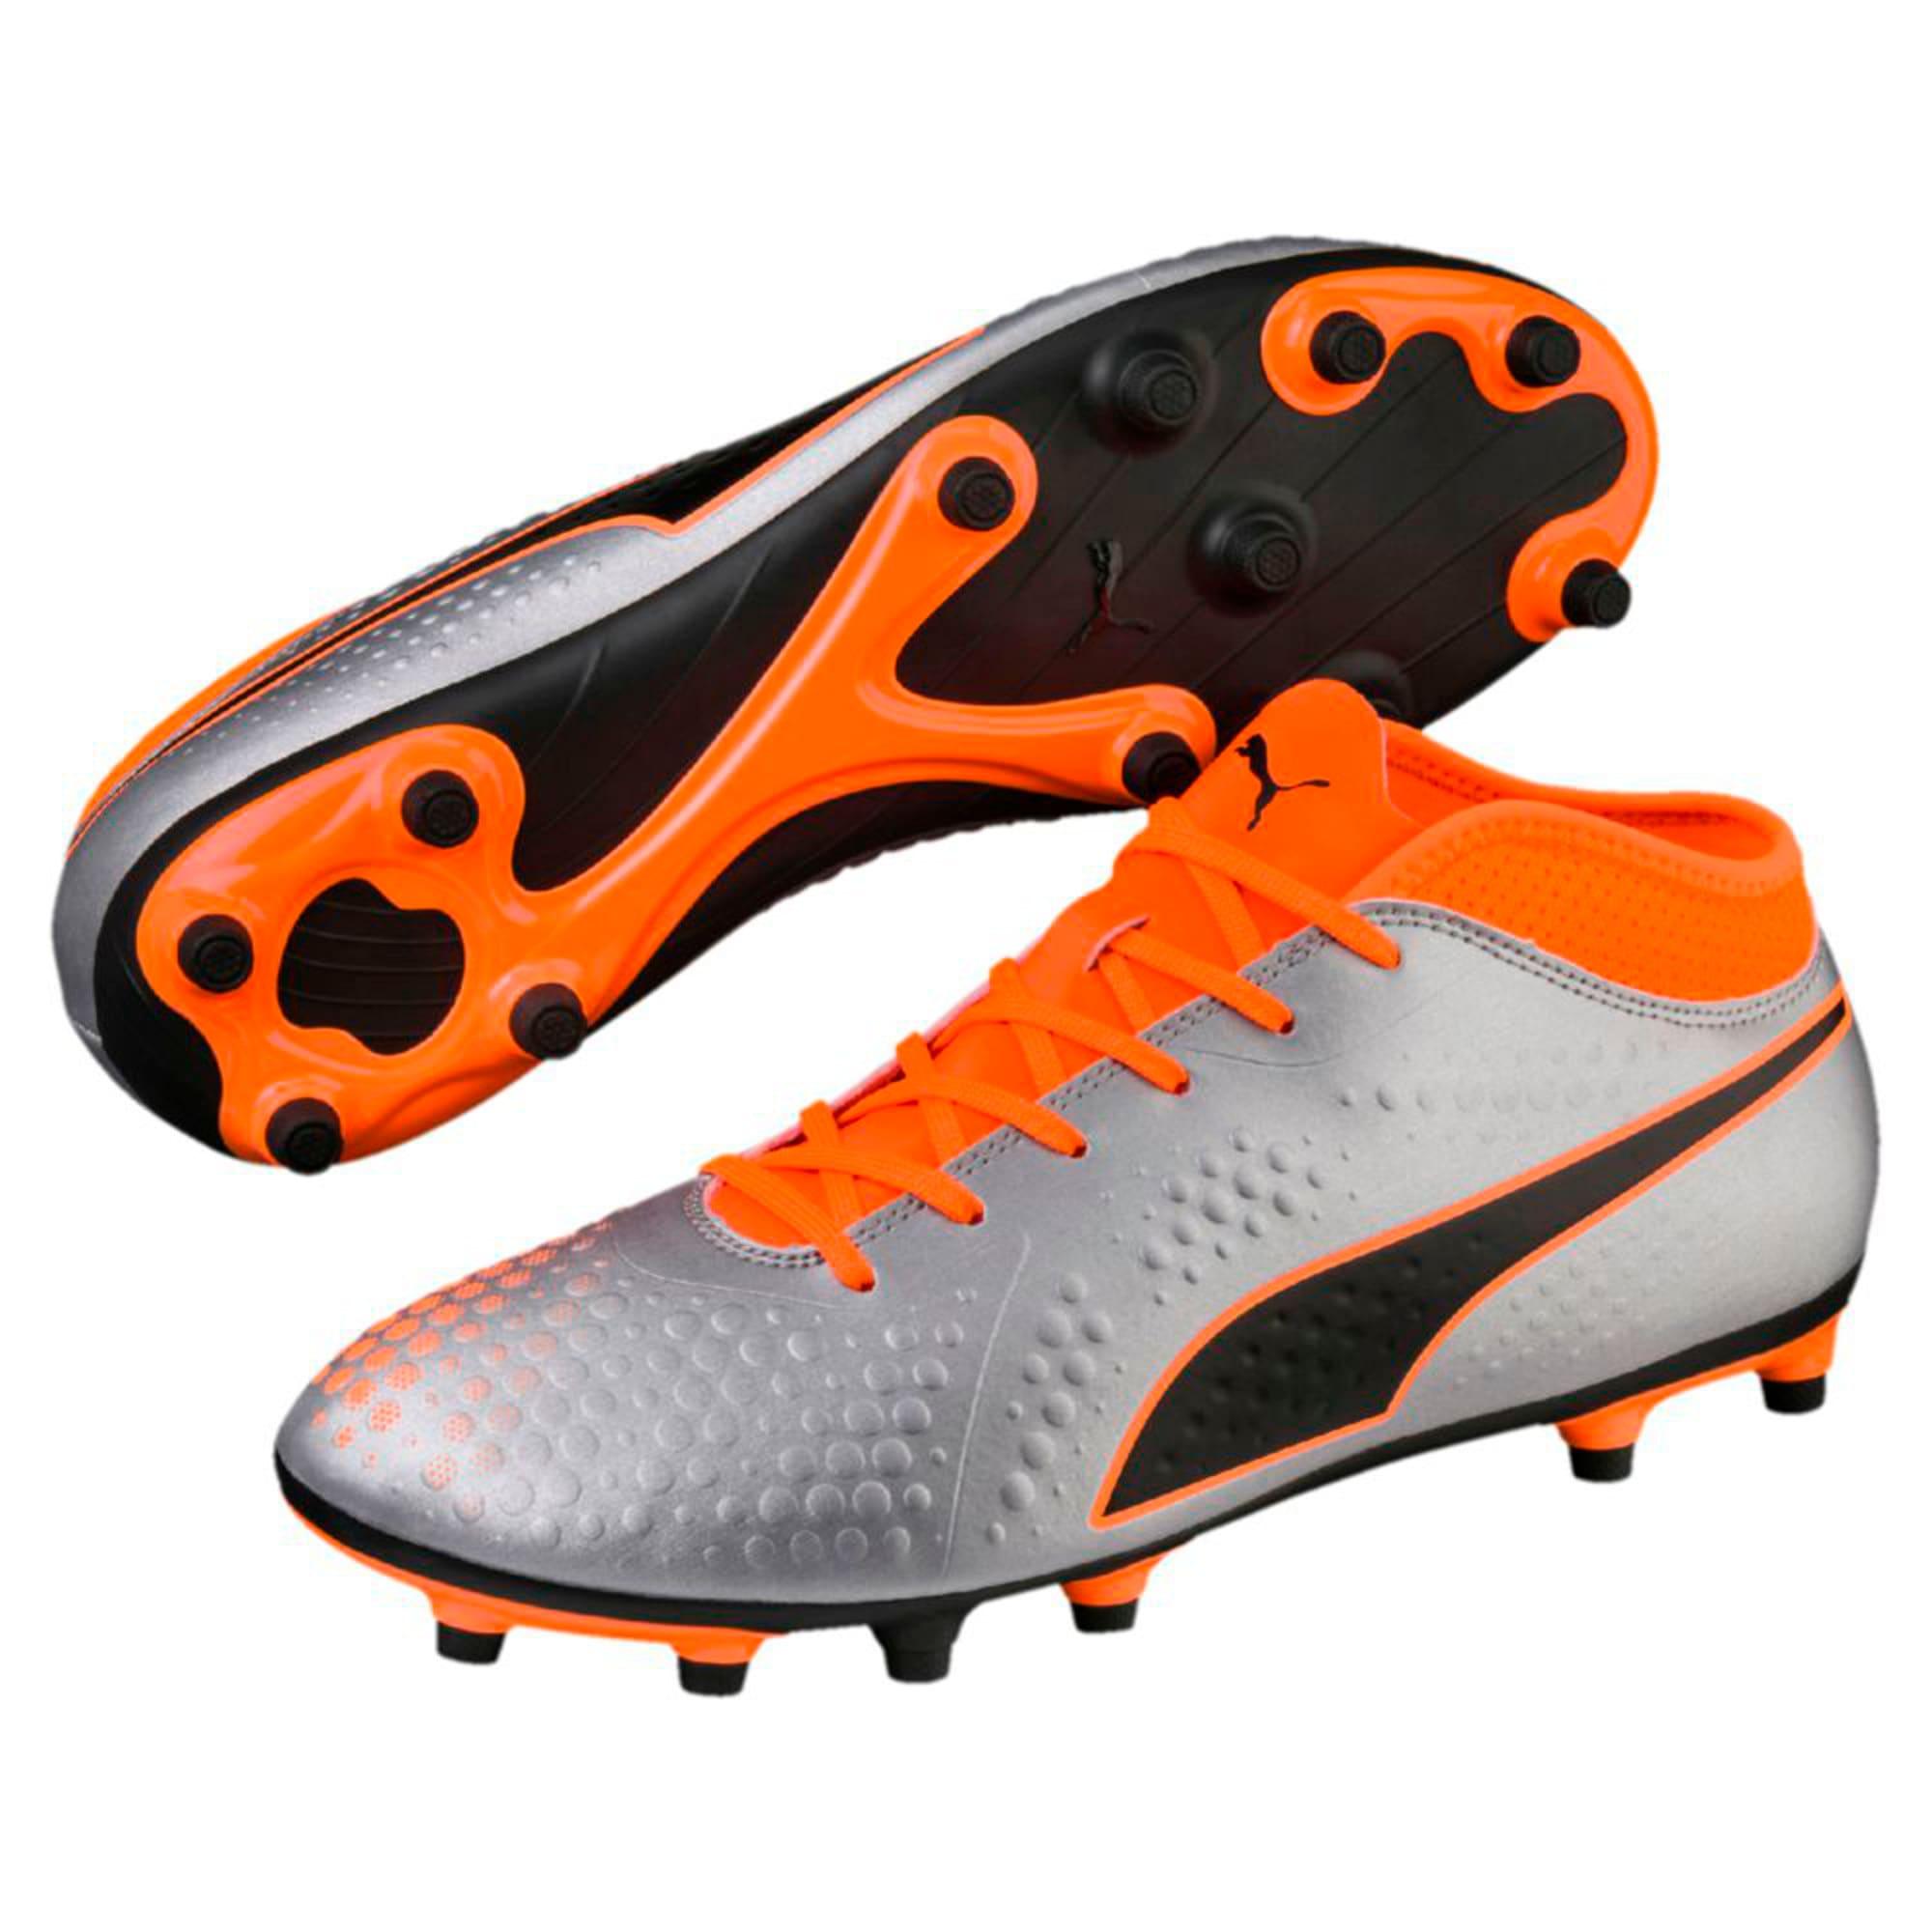 Thumbnail 6 of PUMA ONE 4 Synthetic FG Men's Football Boots, Silver-Orange-Black, medium-IND